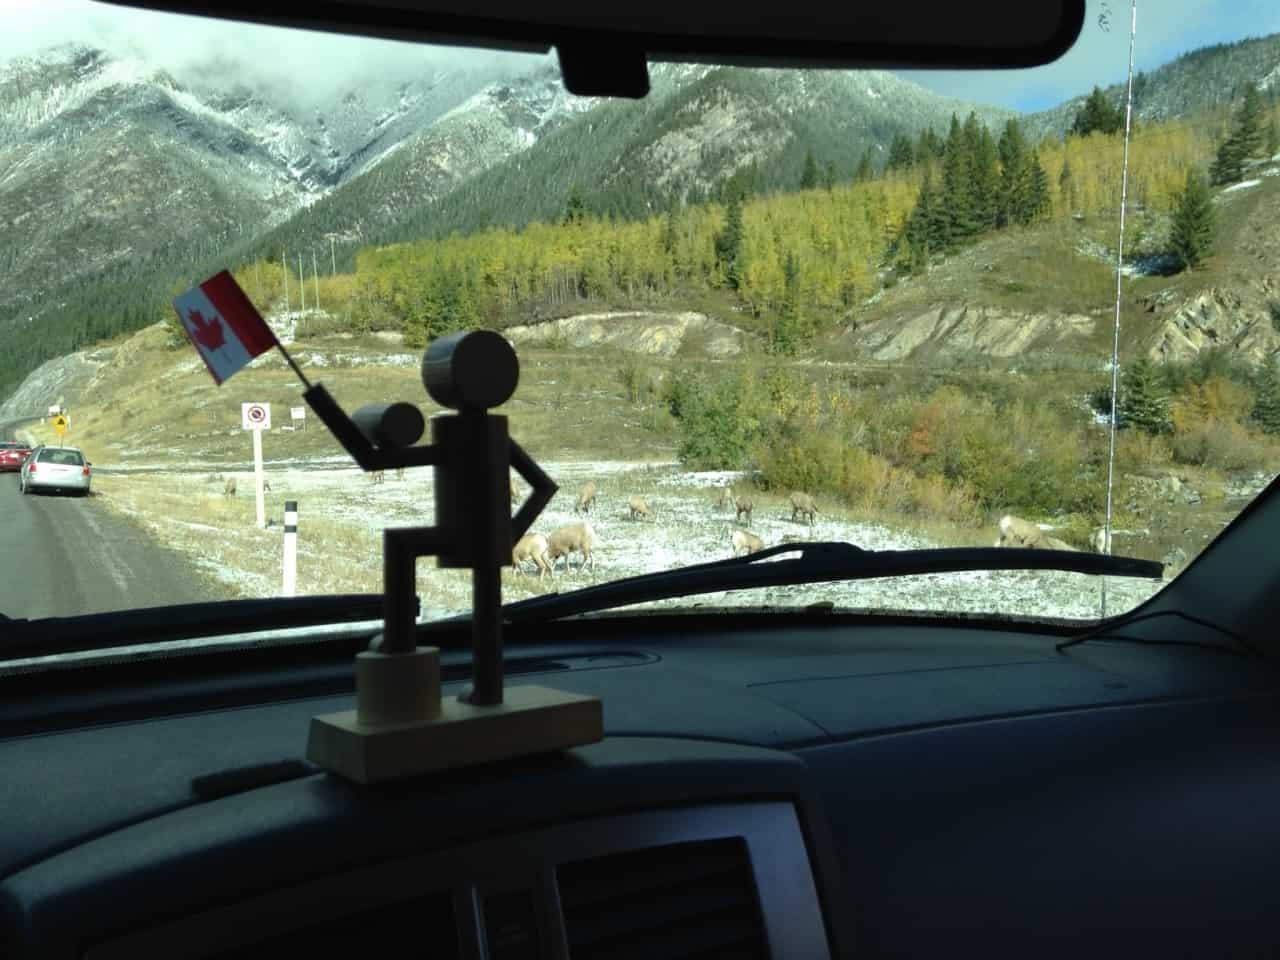 c2252bba6a530aea48d54277.jpg - Jasper parkway, AB - Calgary road trip fall 2014